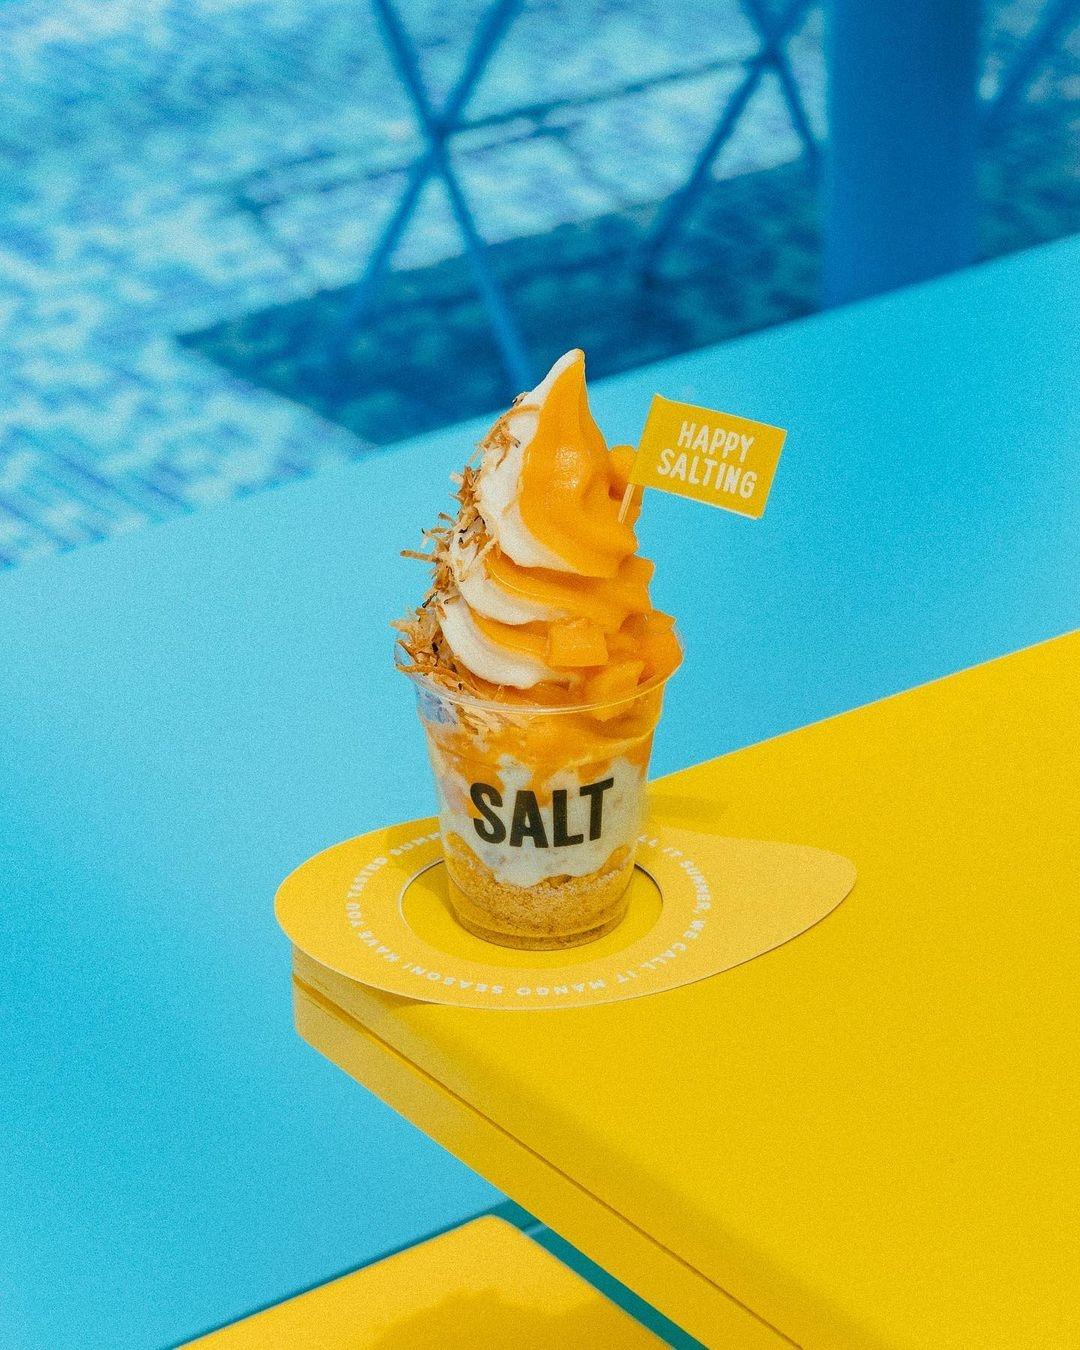 Ice Cream Day: Meet the Best Ice Cream Spots in Dubai